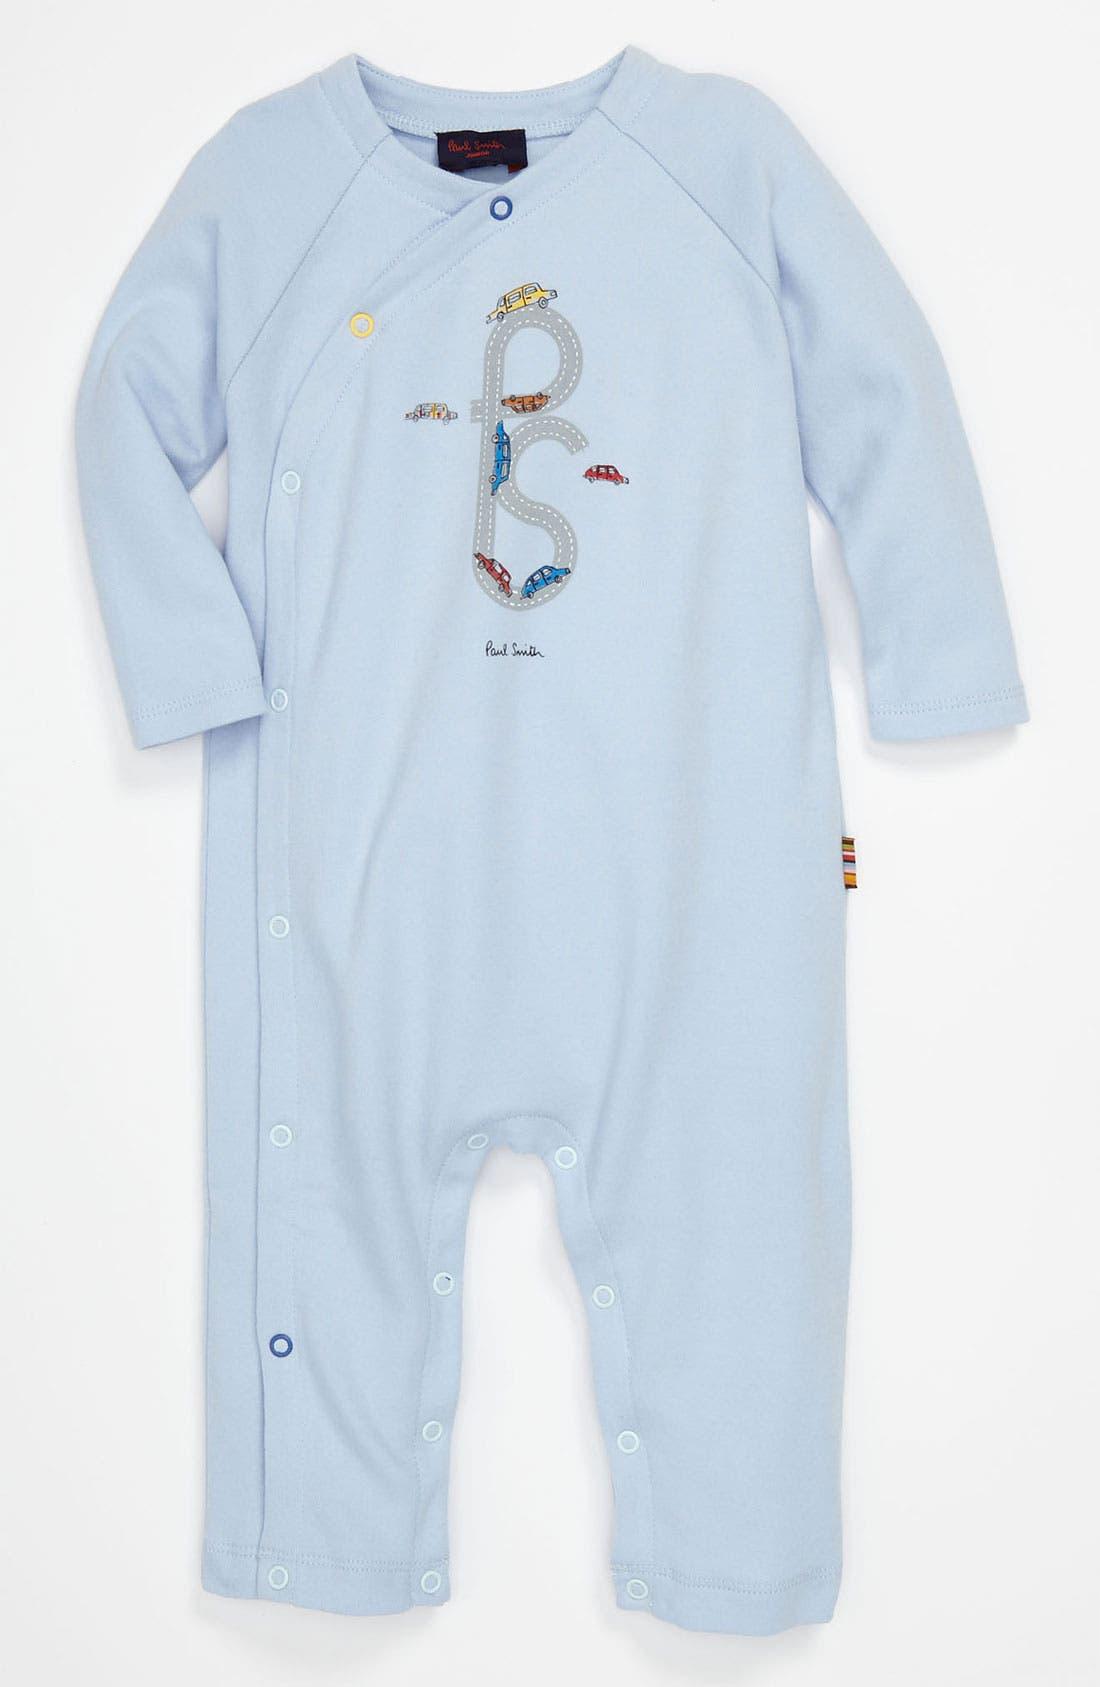 Main Image - Paul Smith Junior Coveralls (Baby)